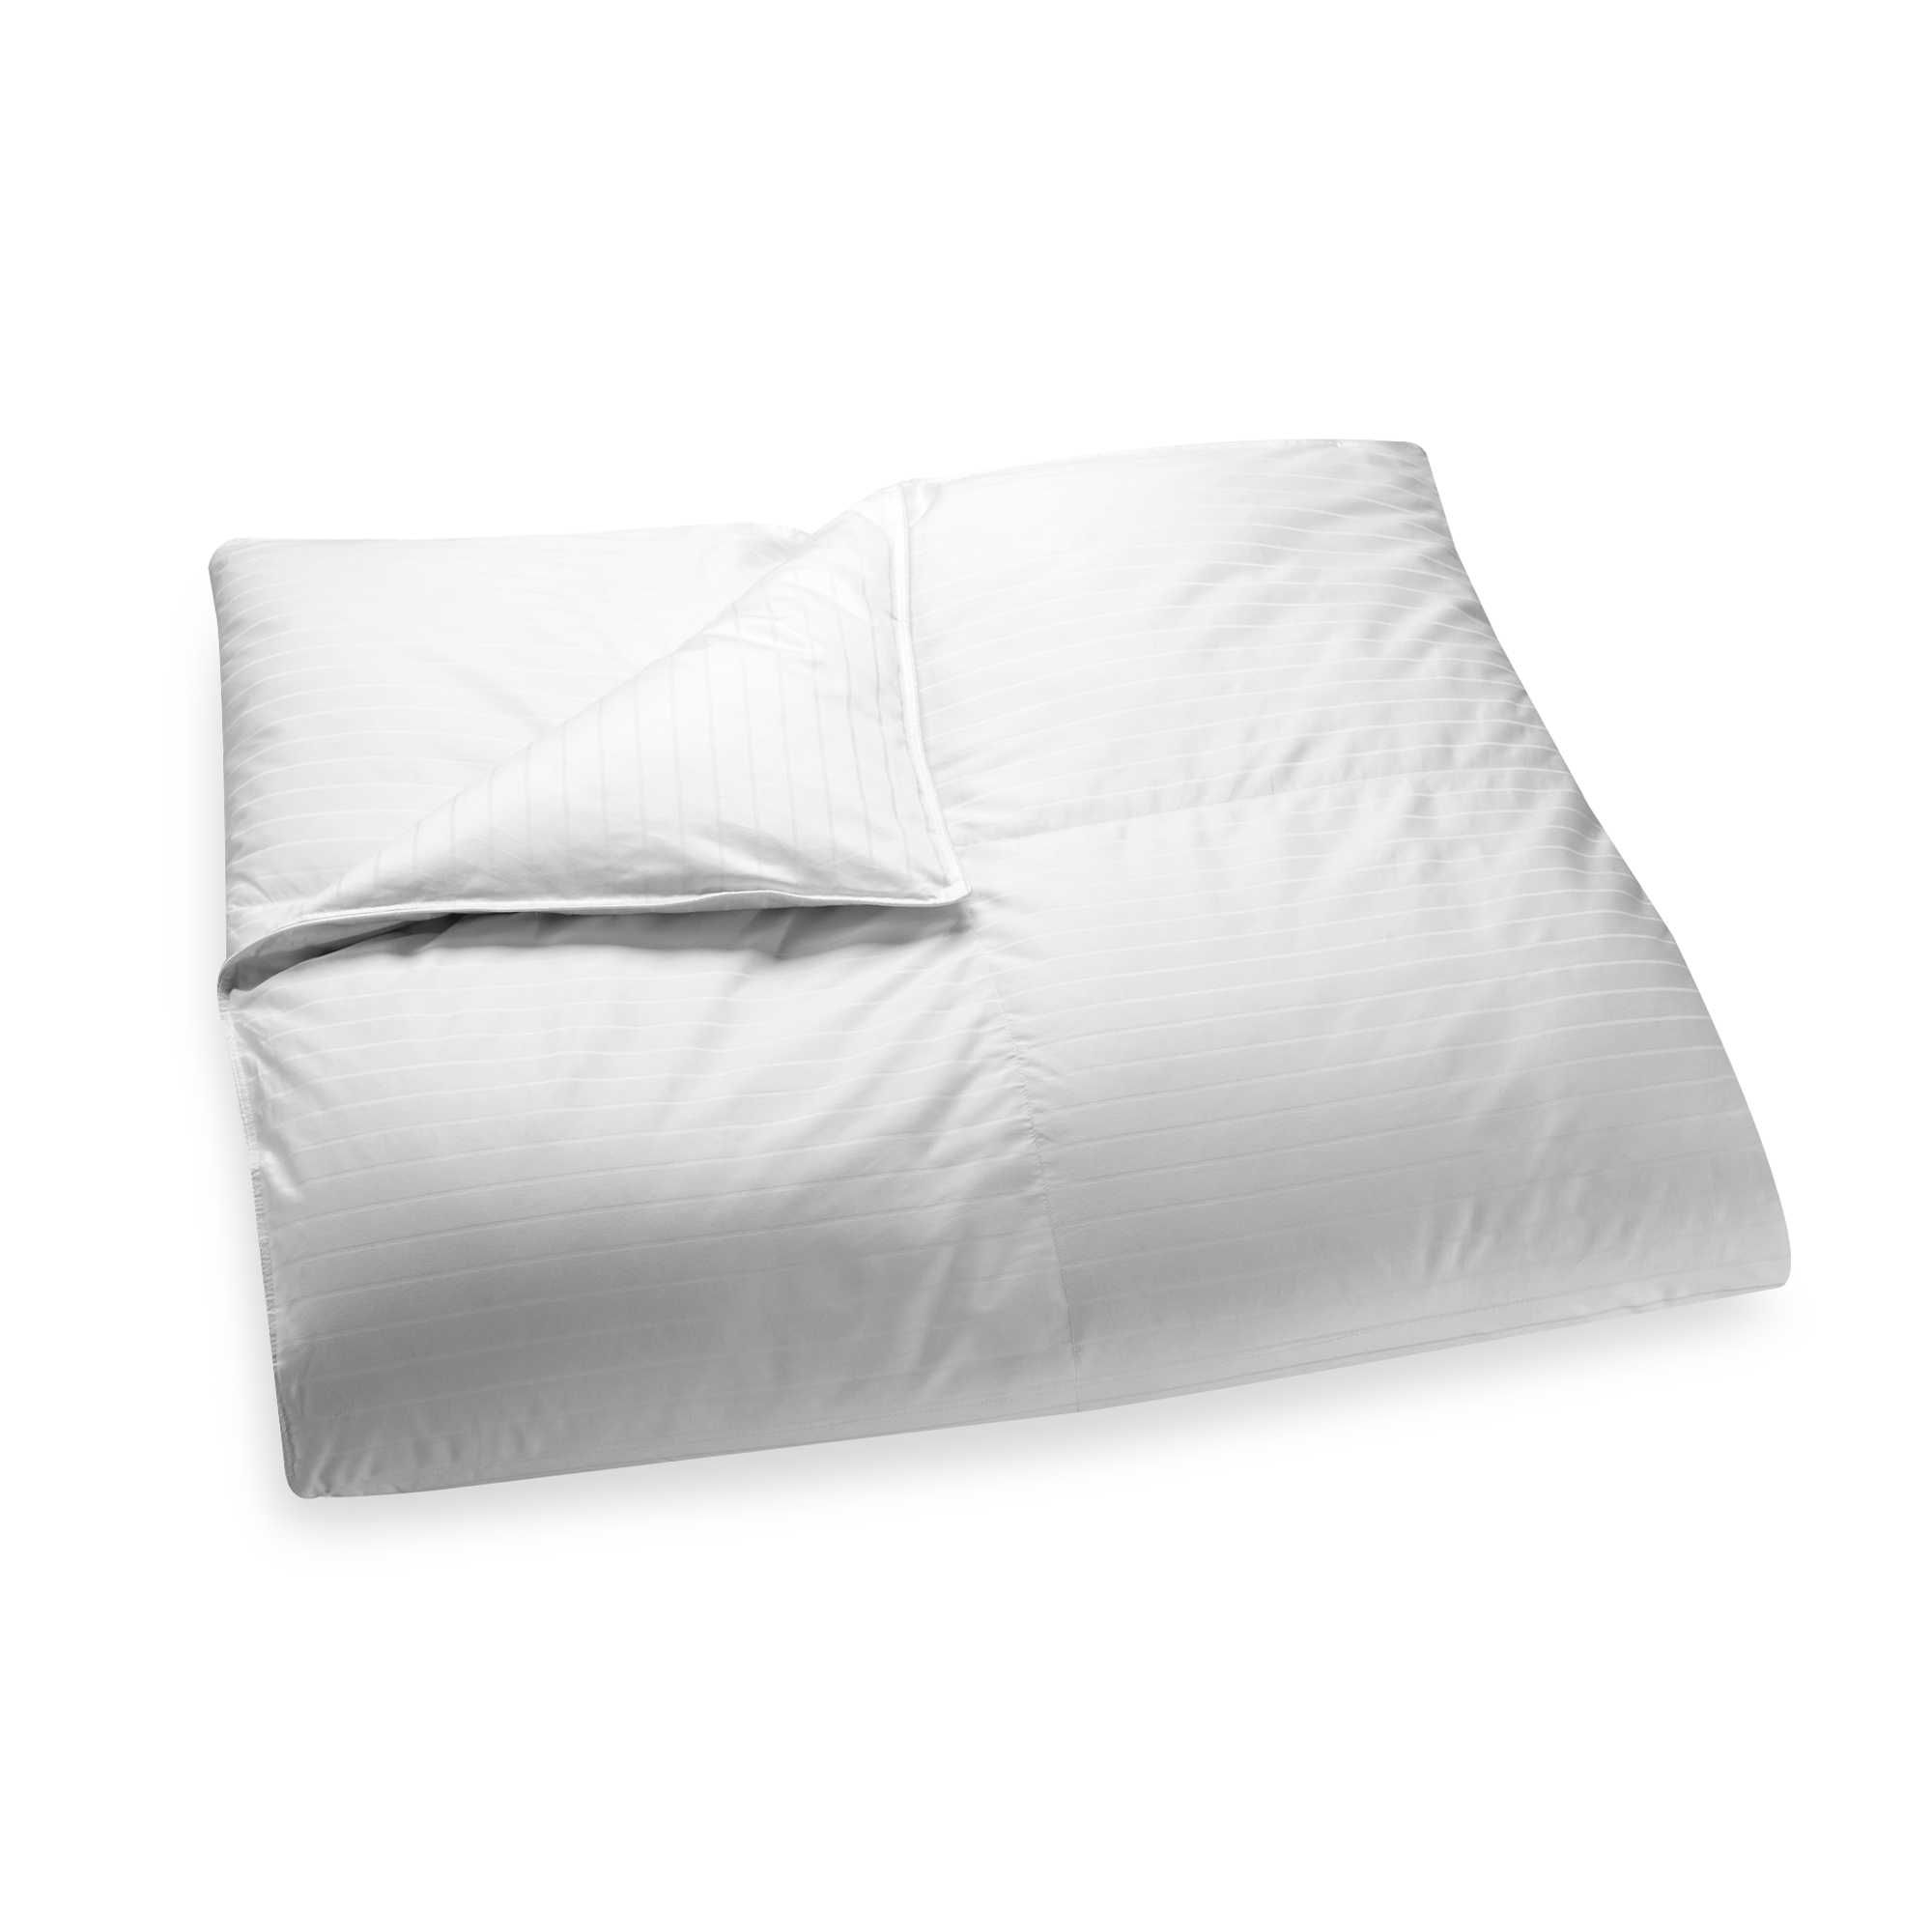 Palais Royale Light Warmth White Goose Down Comforter